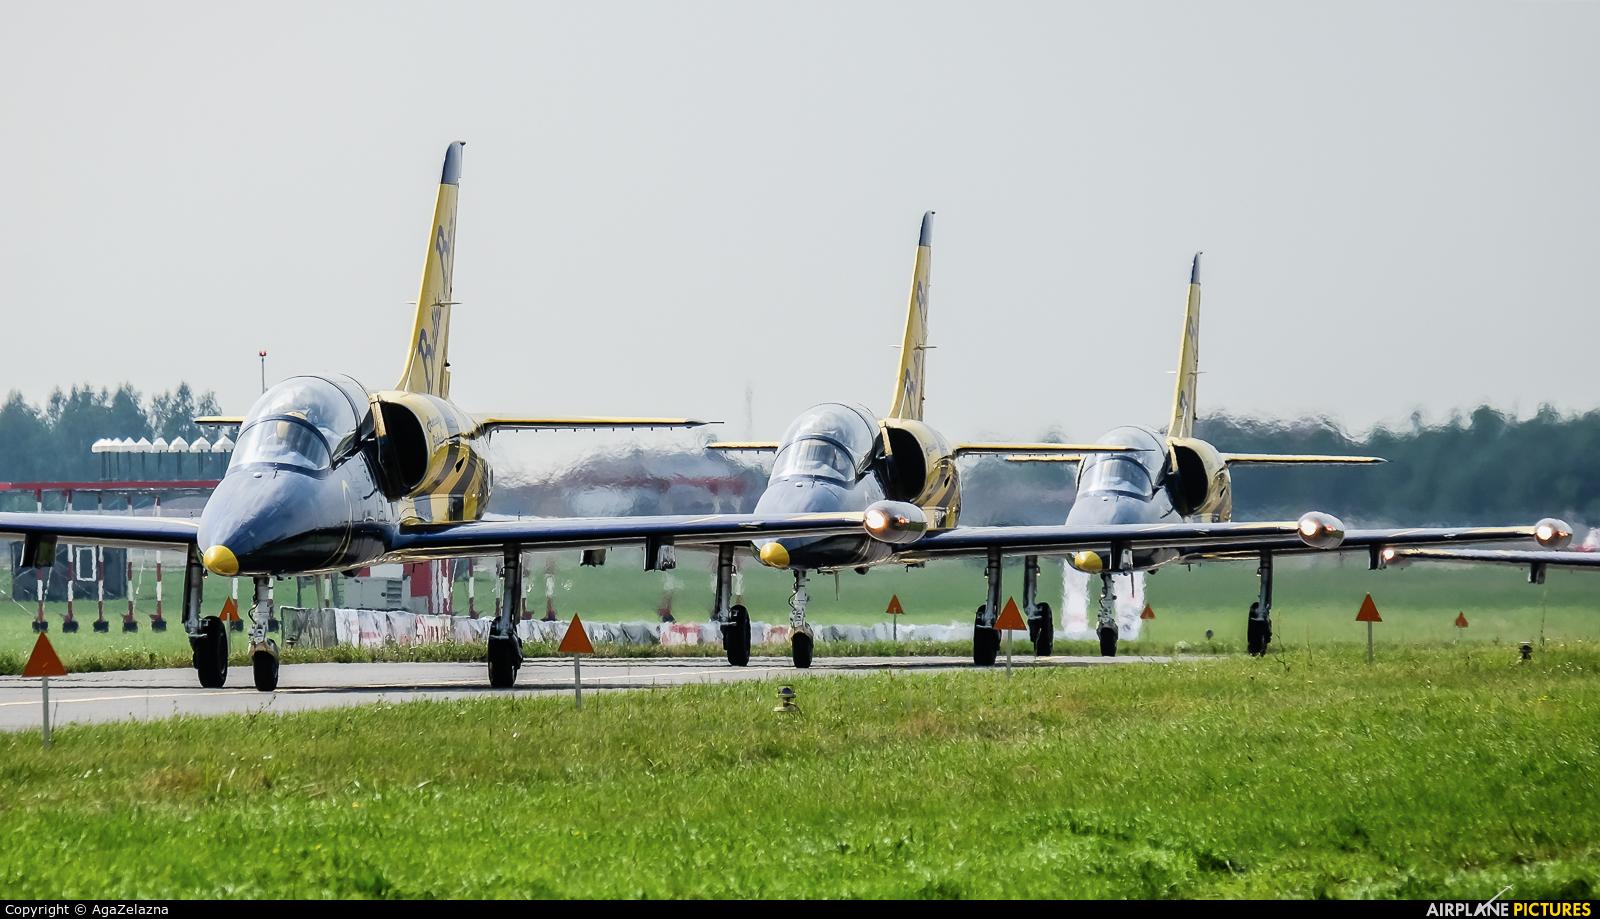 Baltic Bees Jet Team YL-KSH aircraft at Radom - Sadków